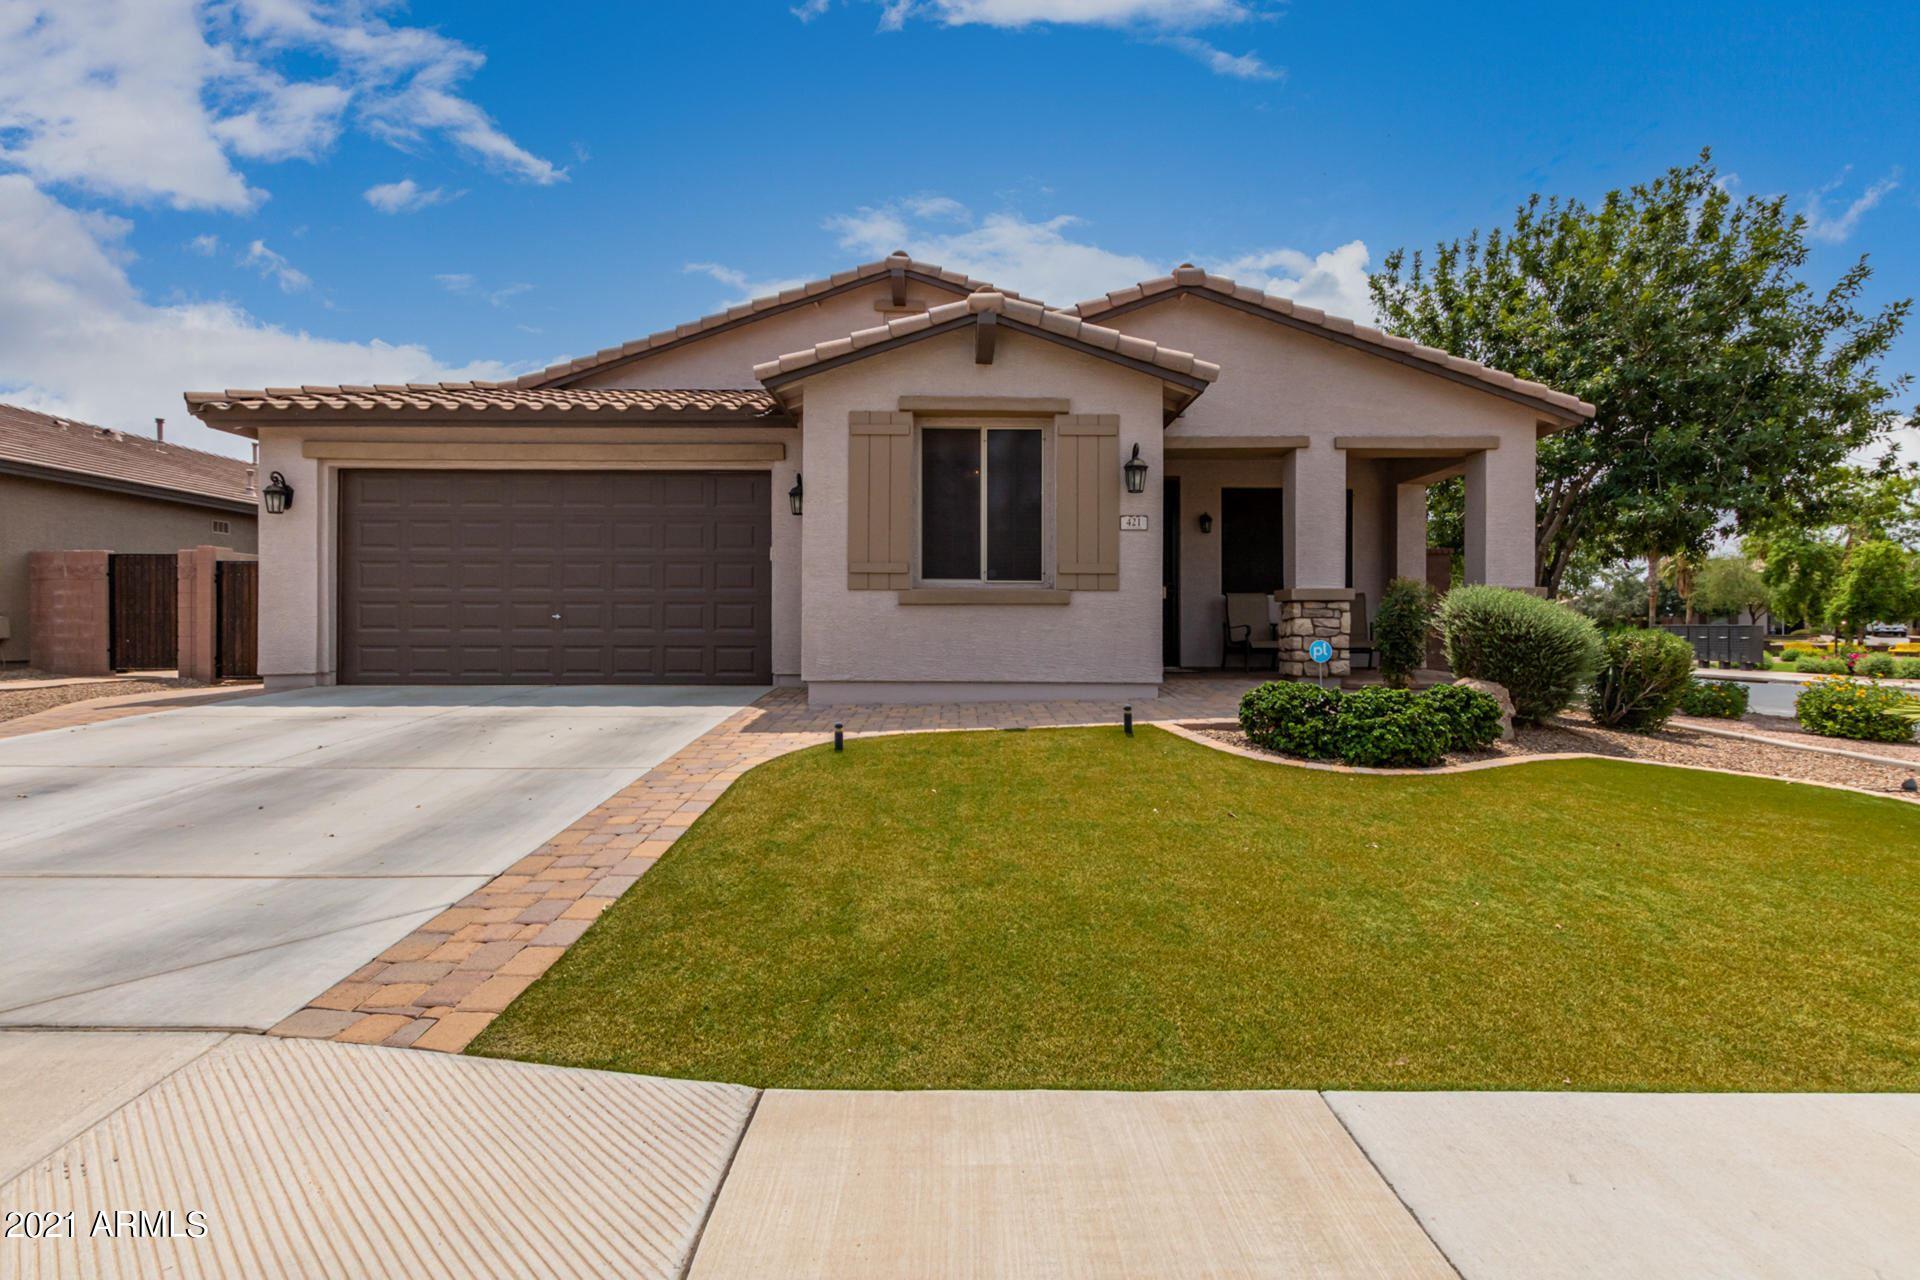 Photo of 421 W Leatherwood Avenue, San Tan Valley, AZ 85140 (MLS # 6266807)